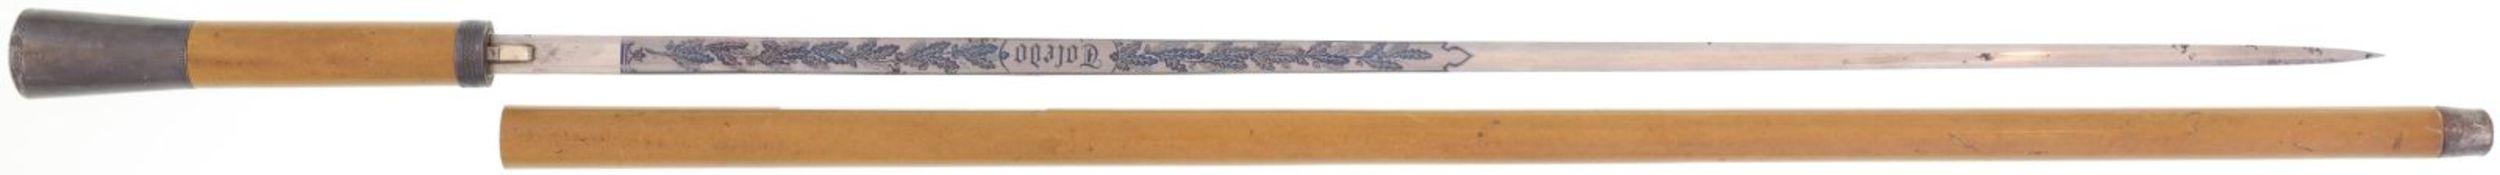 Stockdegen, Toledo@ KL 700mm, TL 890mm, Klinge symmetrische Form, volle Wurzel, hintere Hälfte mit